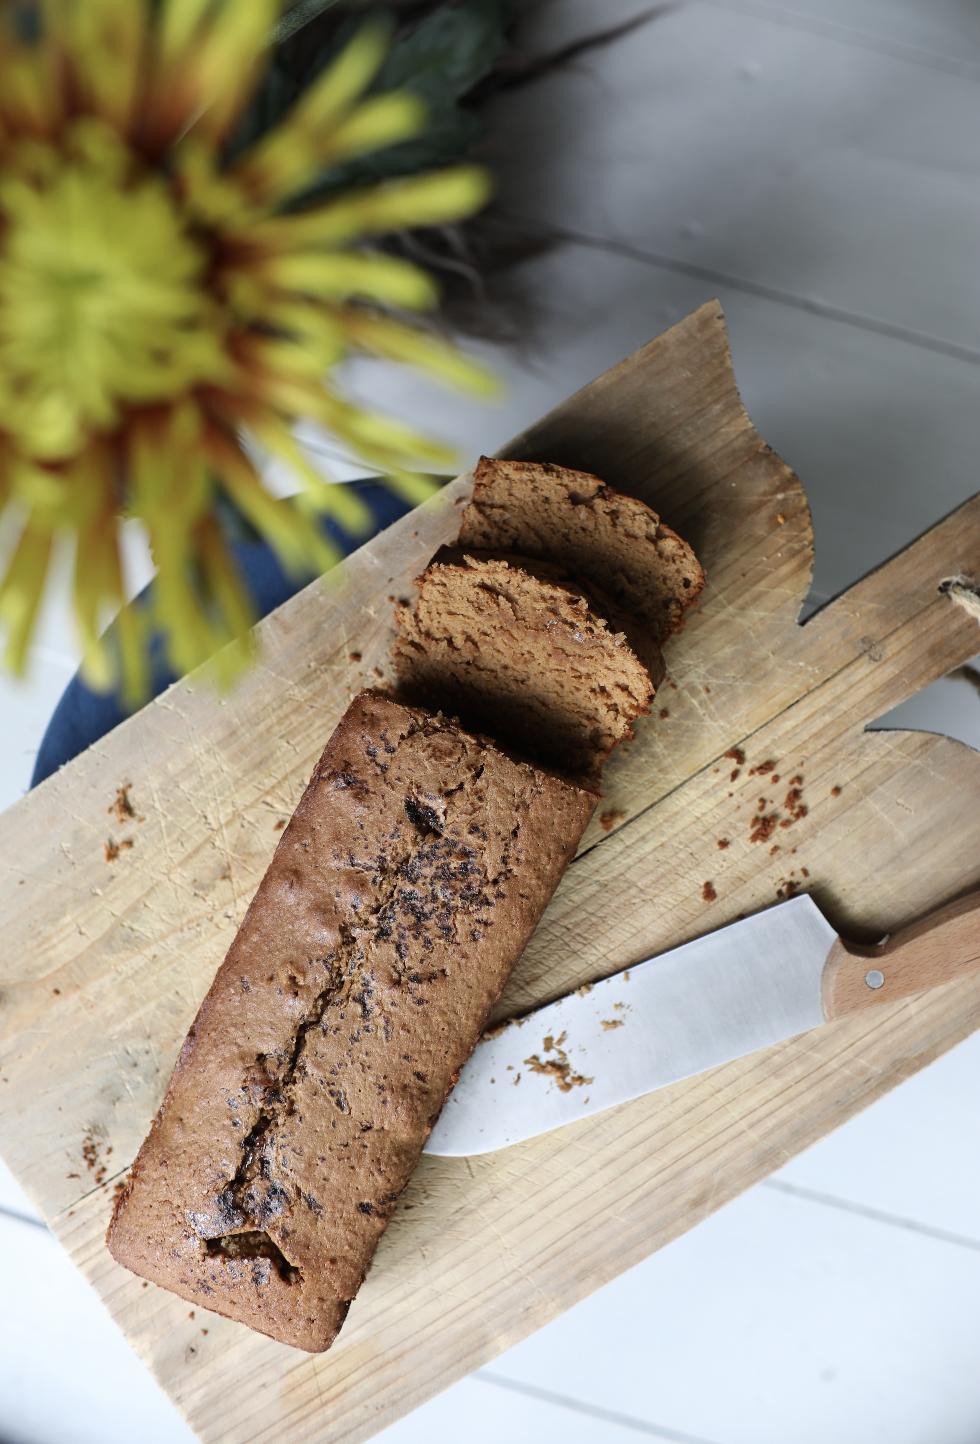 recept cake taart lemon food interieur styling the nice stuff collector blog blogger theo-bert pot 1.png